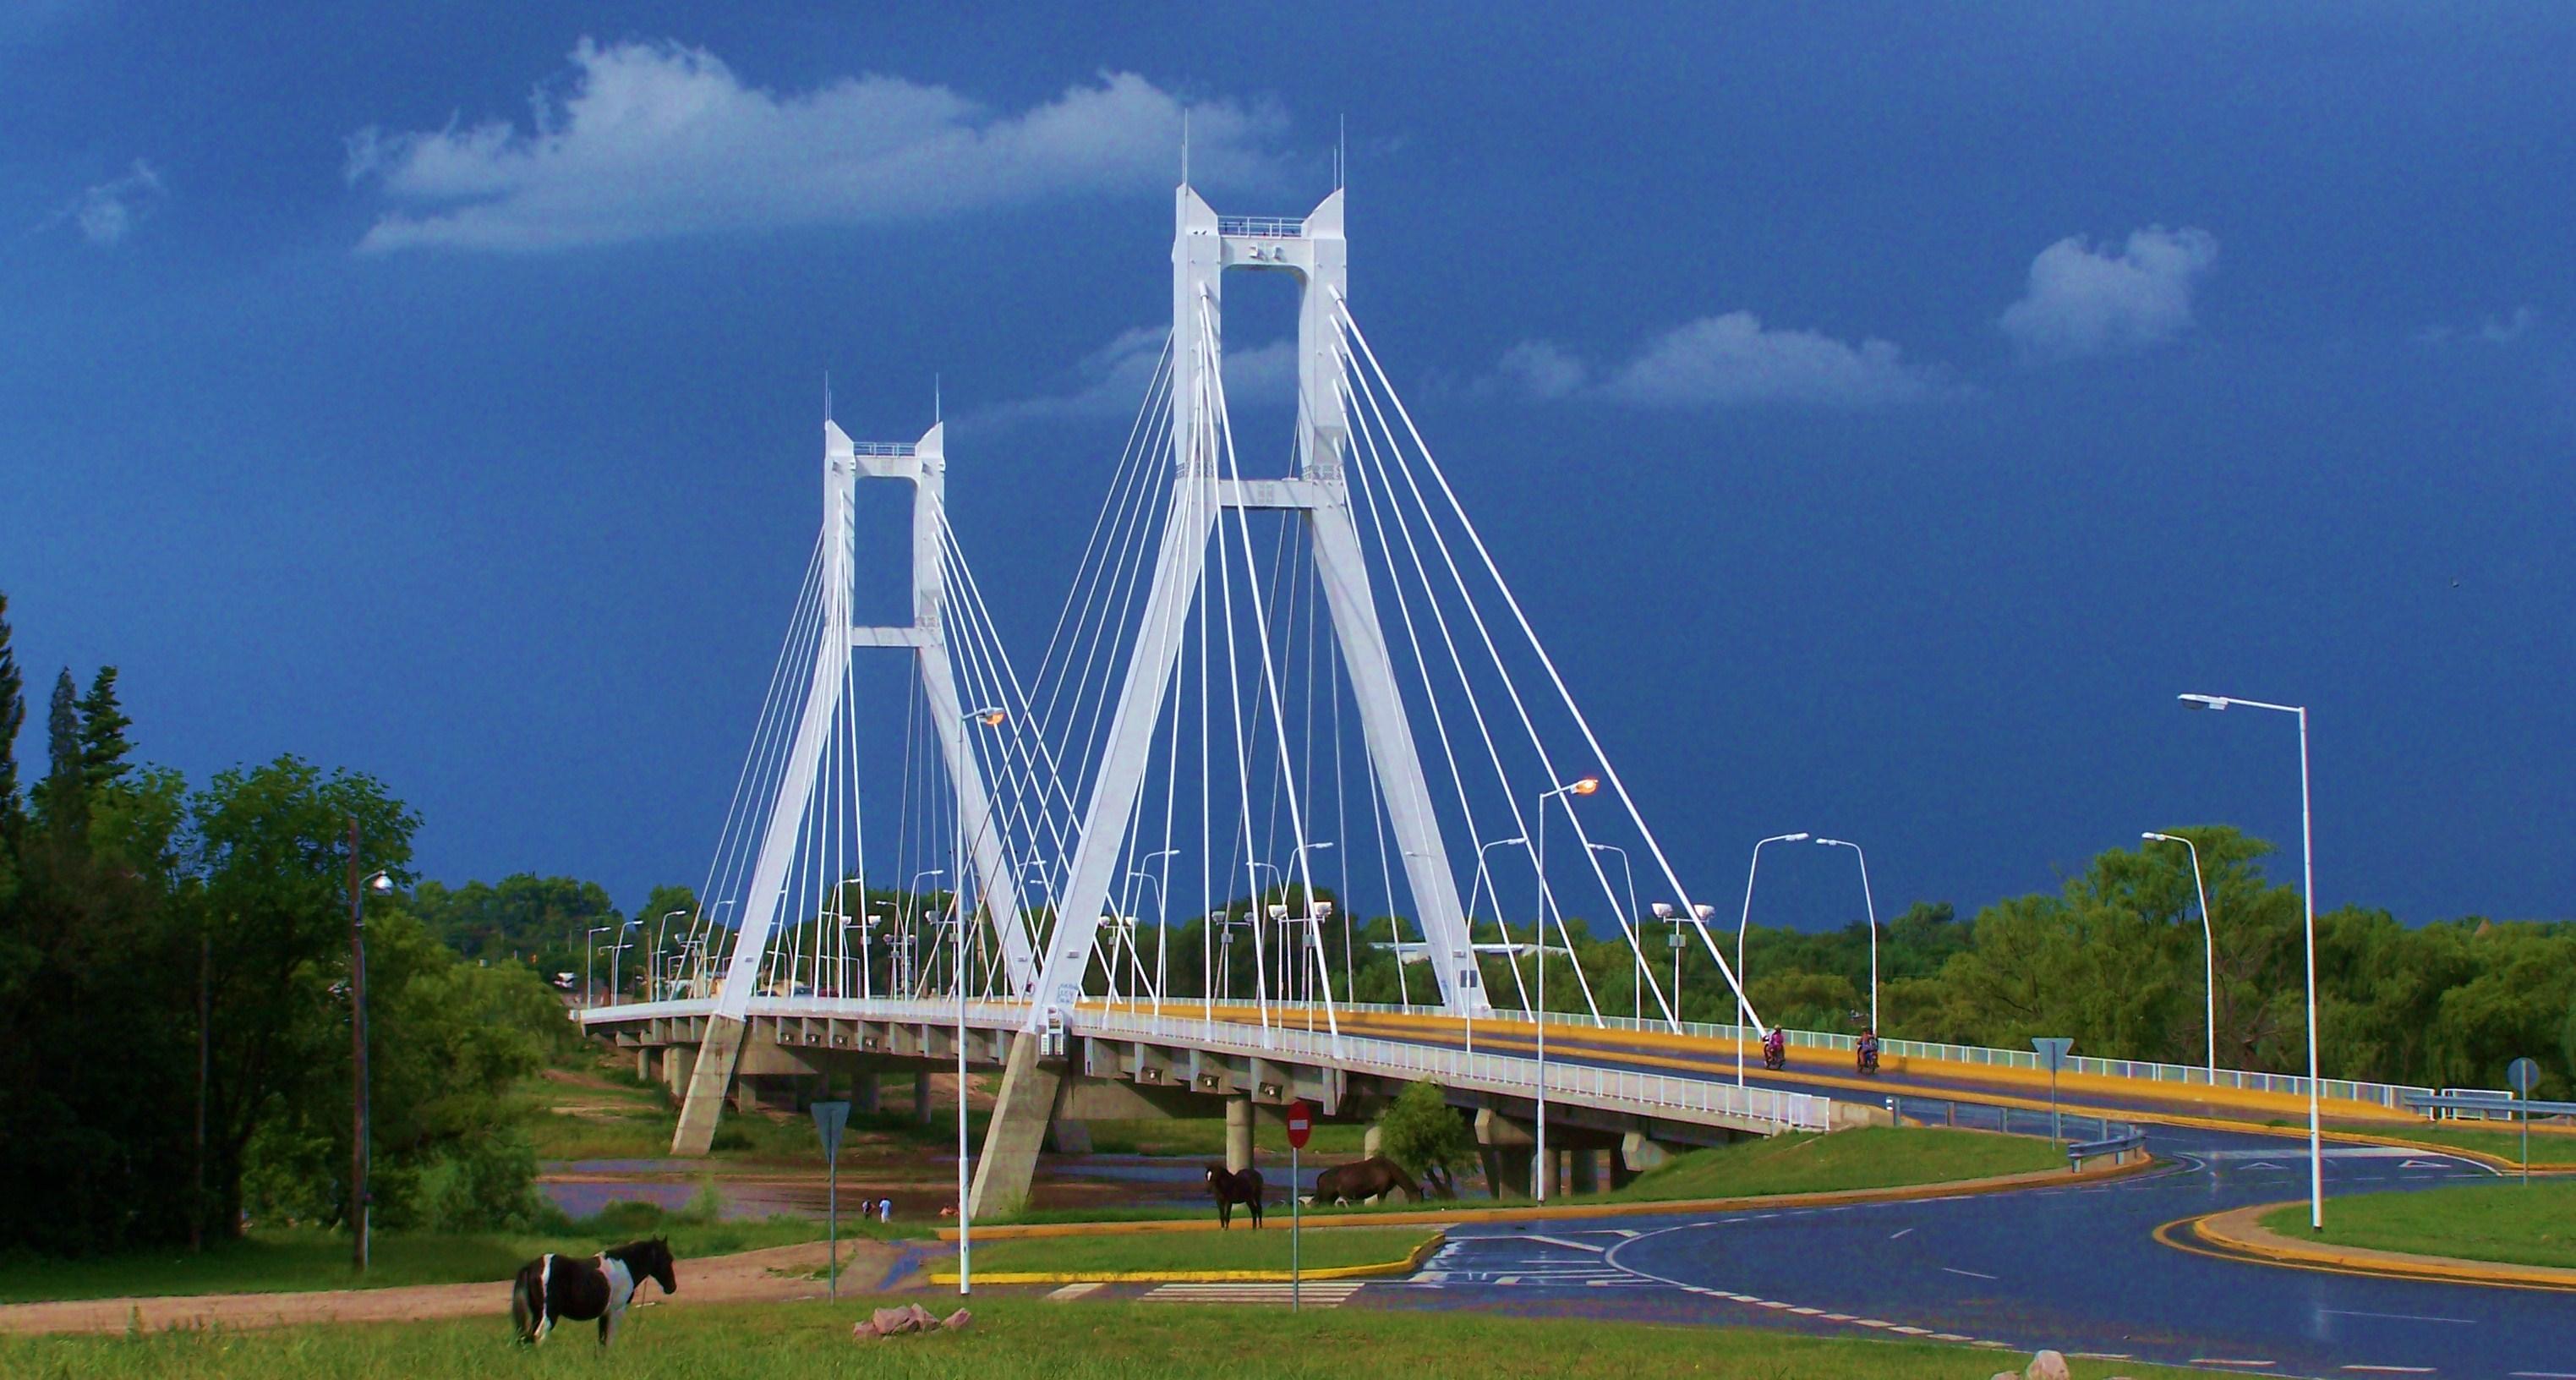 File:Puente Colgante Río Cuarto..JPG - Wikimedia Commons